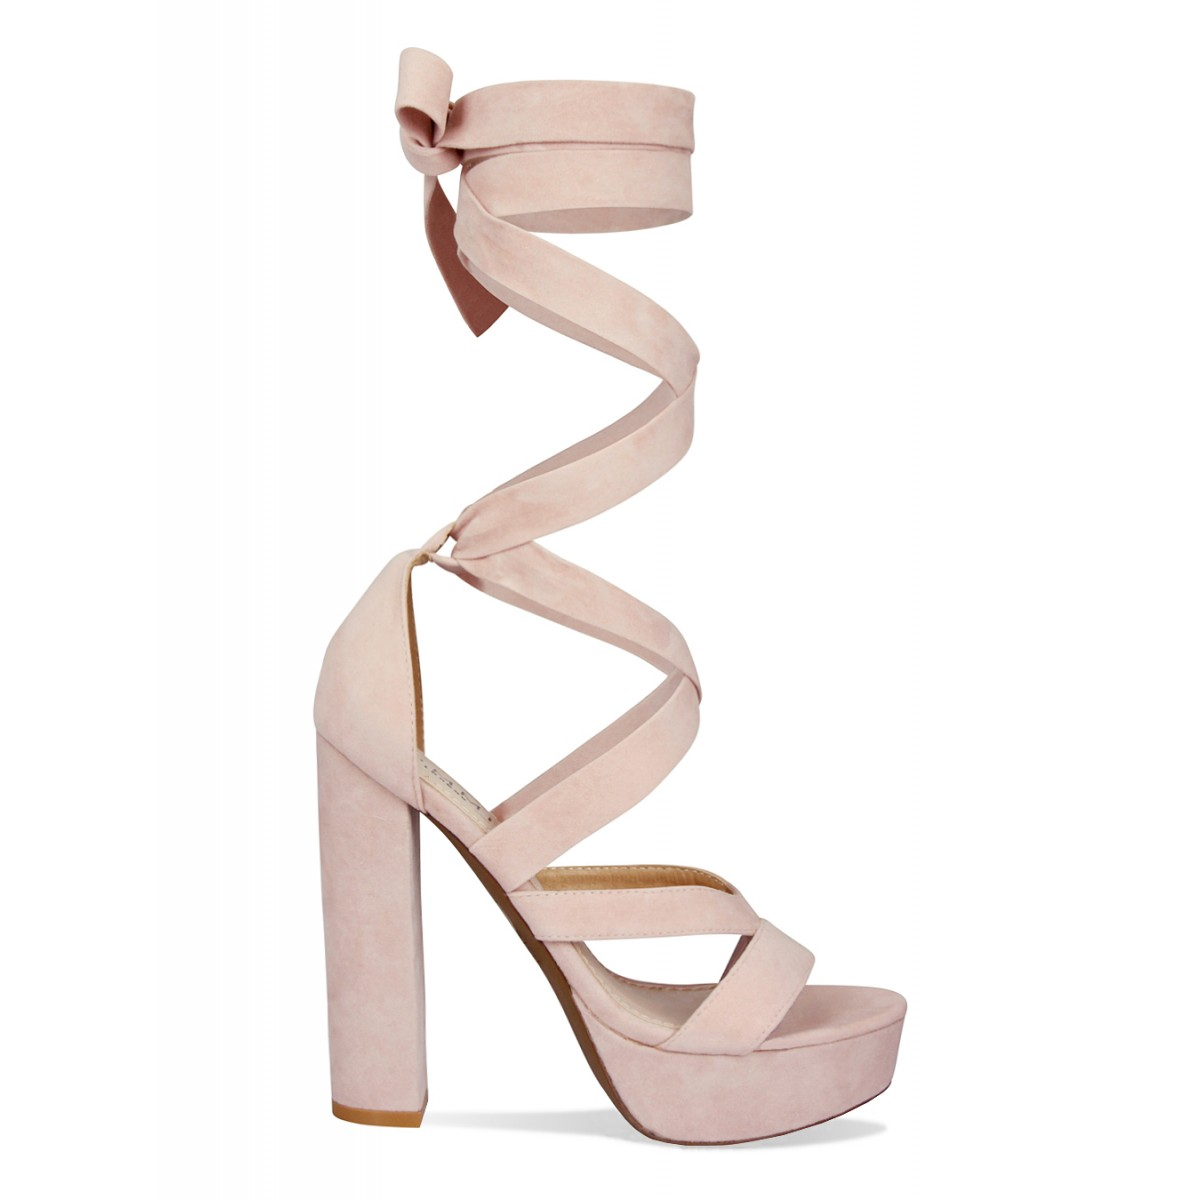 94199c29b3ad Amelia Nude Suede Lace Up Platform Heels   Simmi Shoes